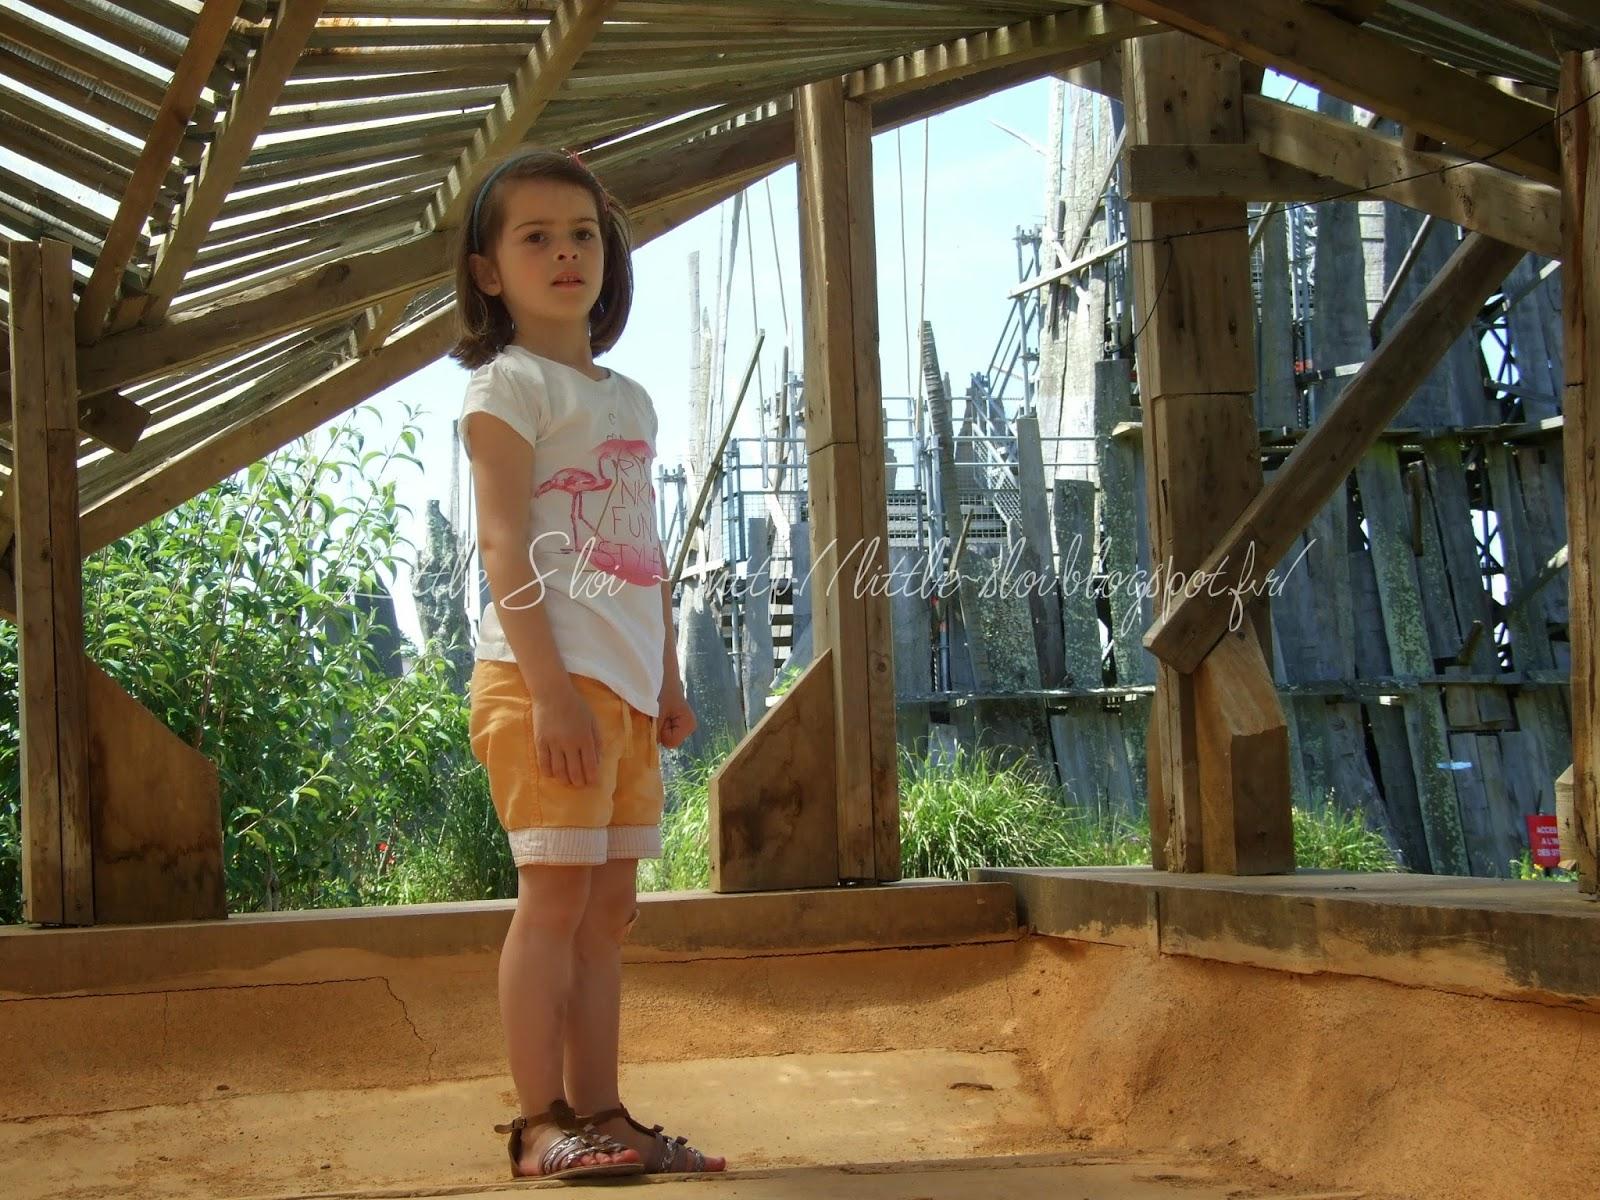 Little slo le jardin toil paimb uf le voyage for Jardin etoile paimboeuf